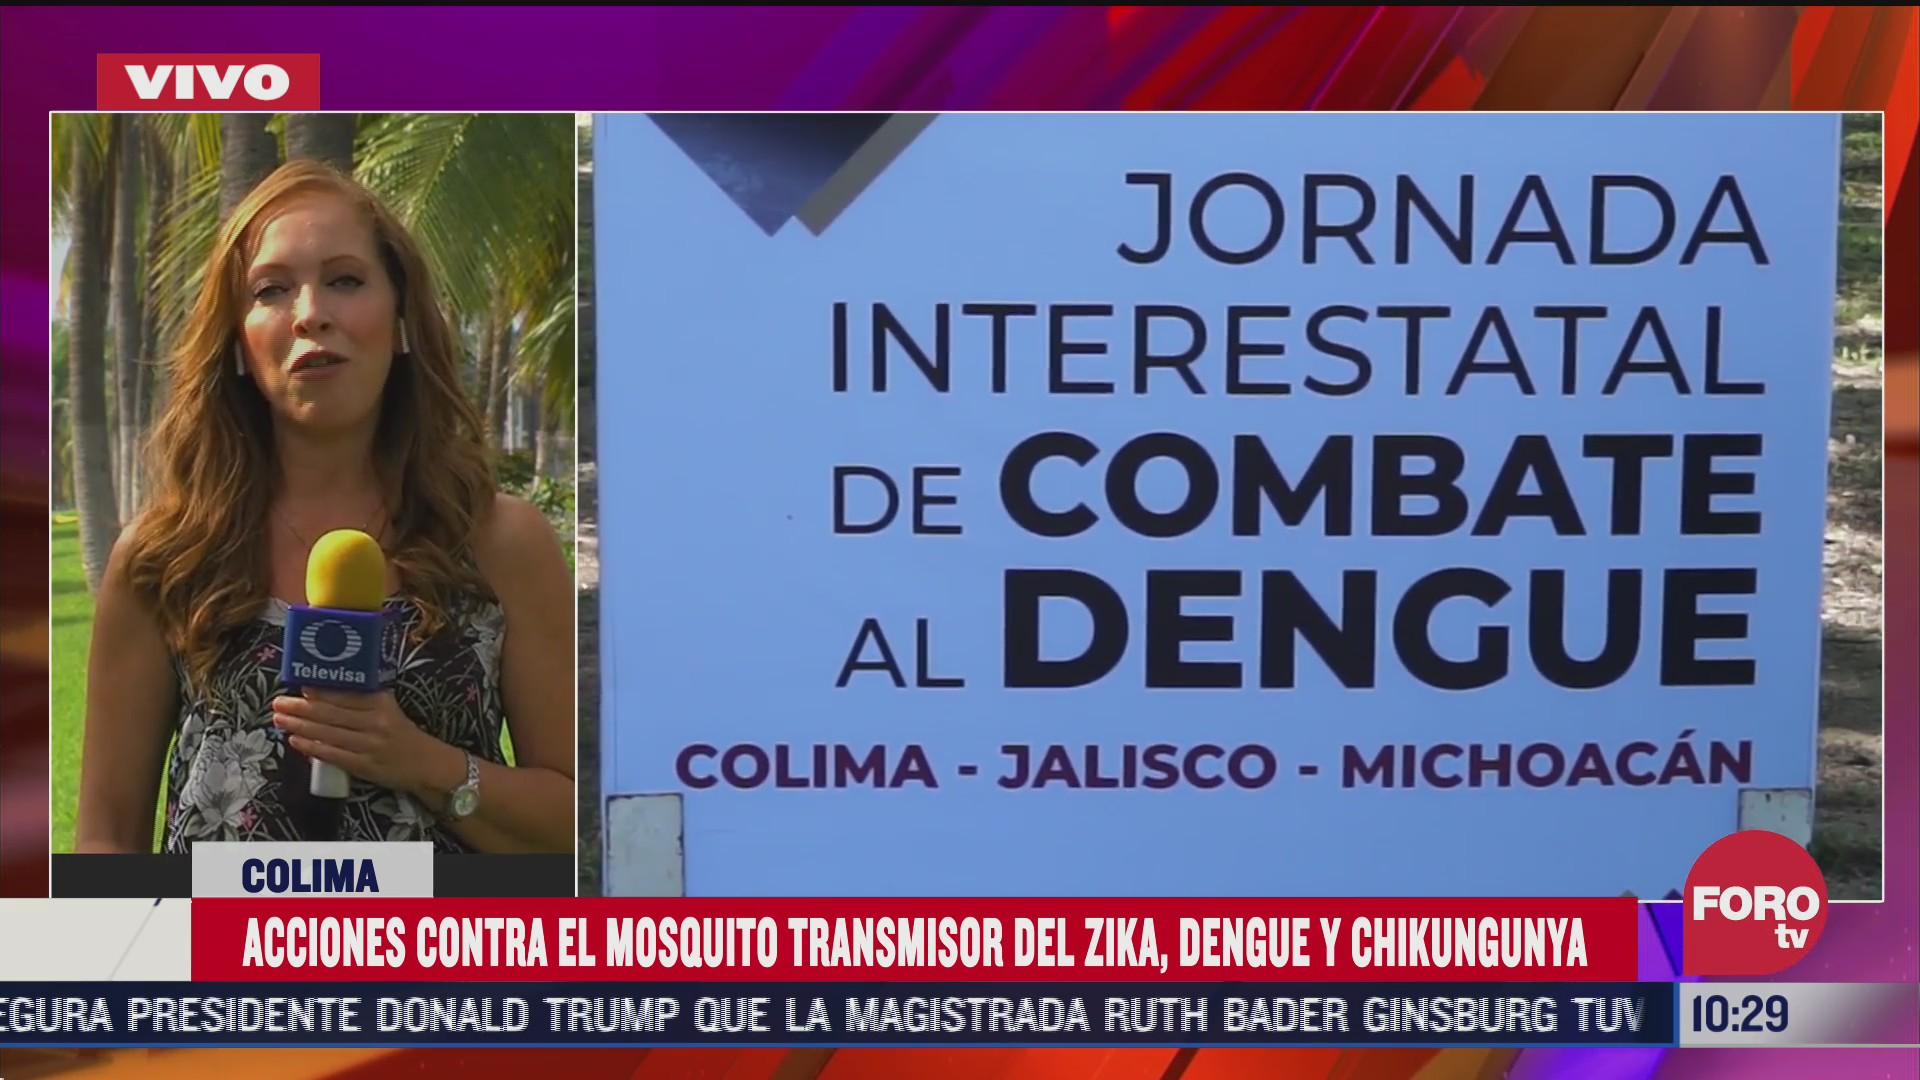 jalisco colima y michoacan inicia operativo contra mosquito transmisor del dengue